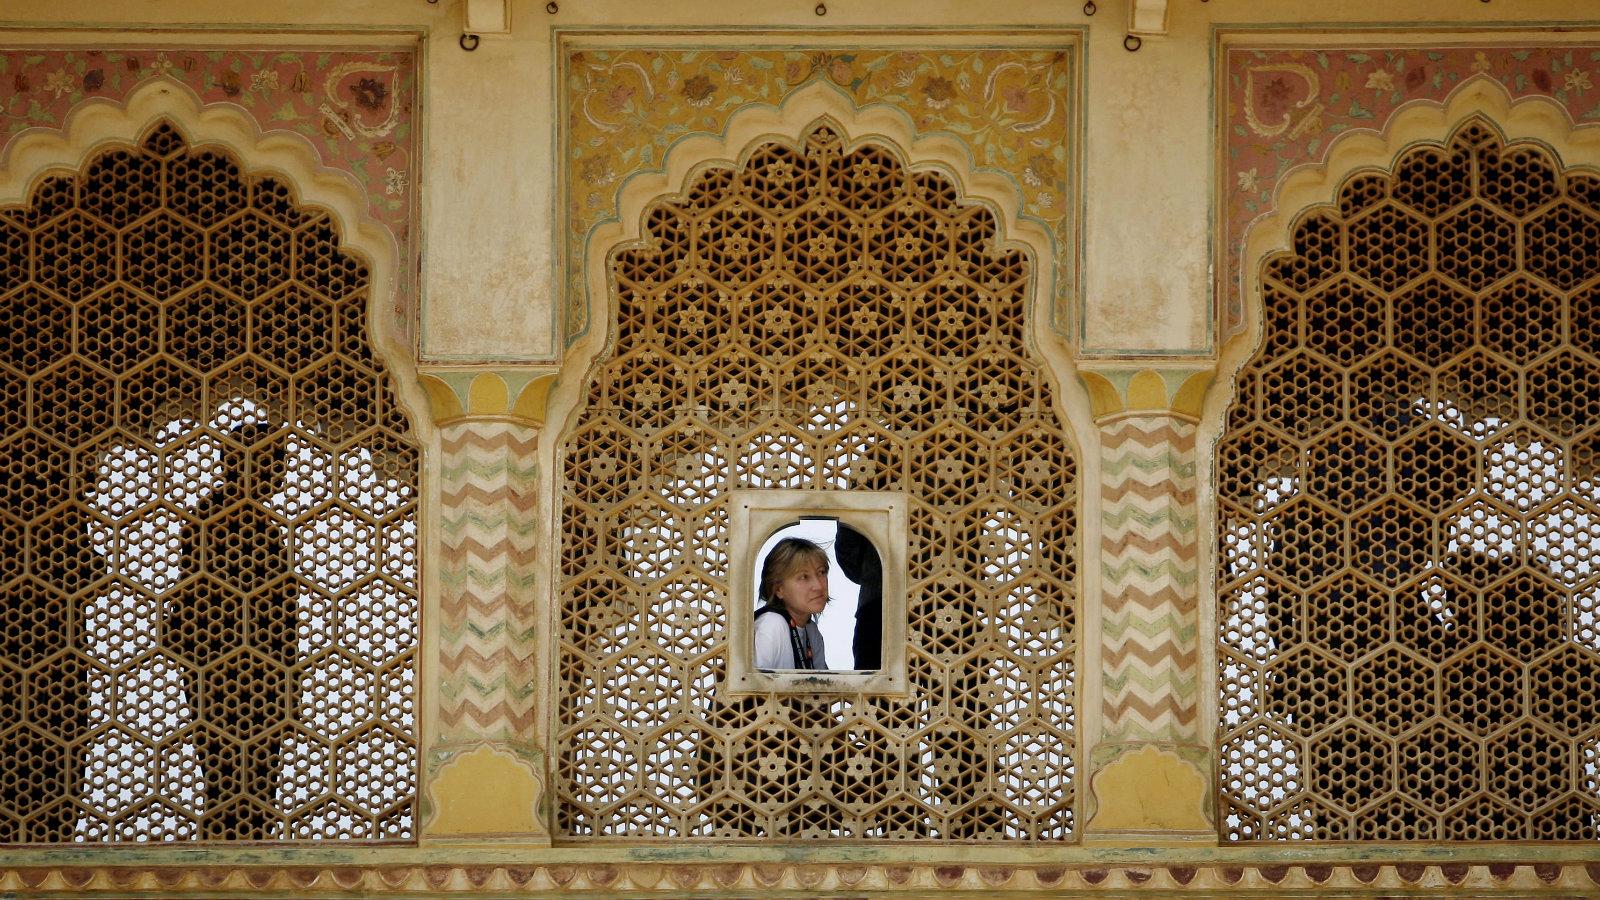 India-architecture-history